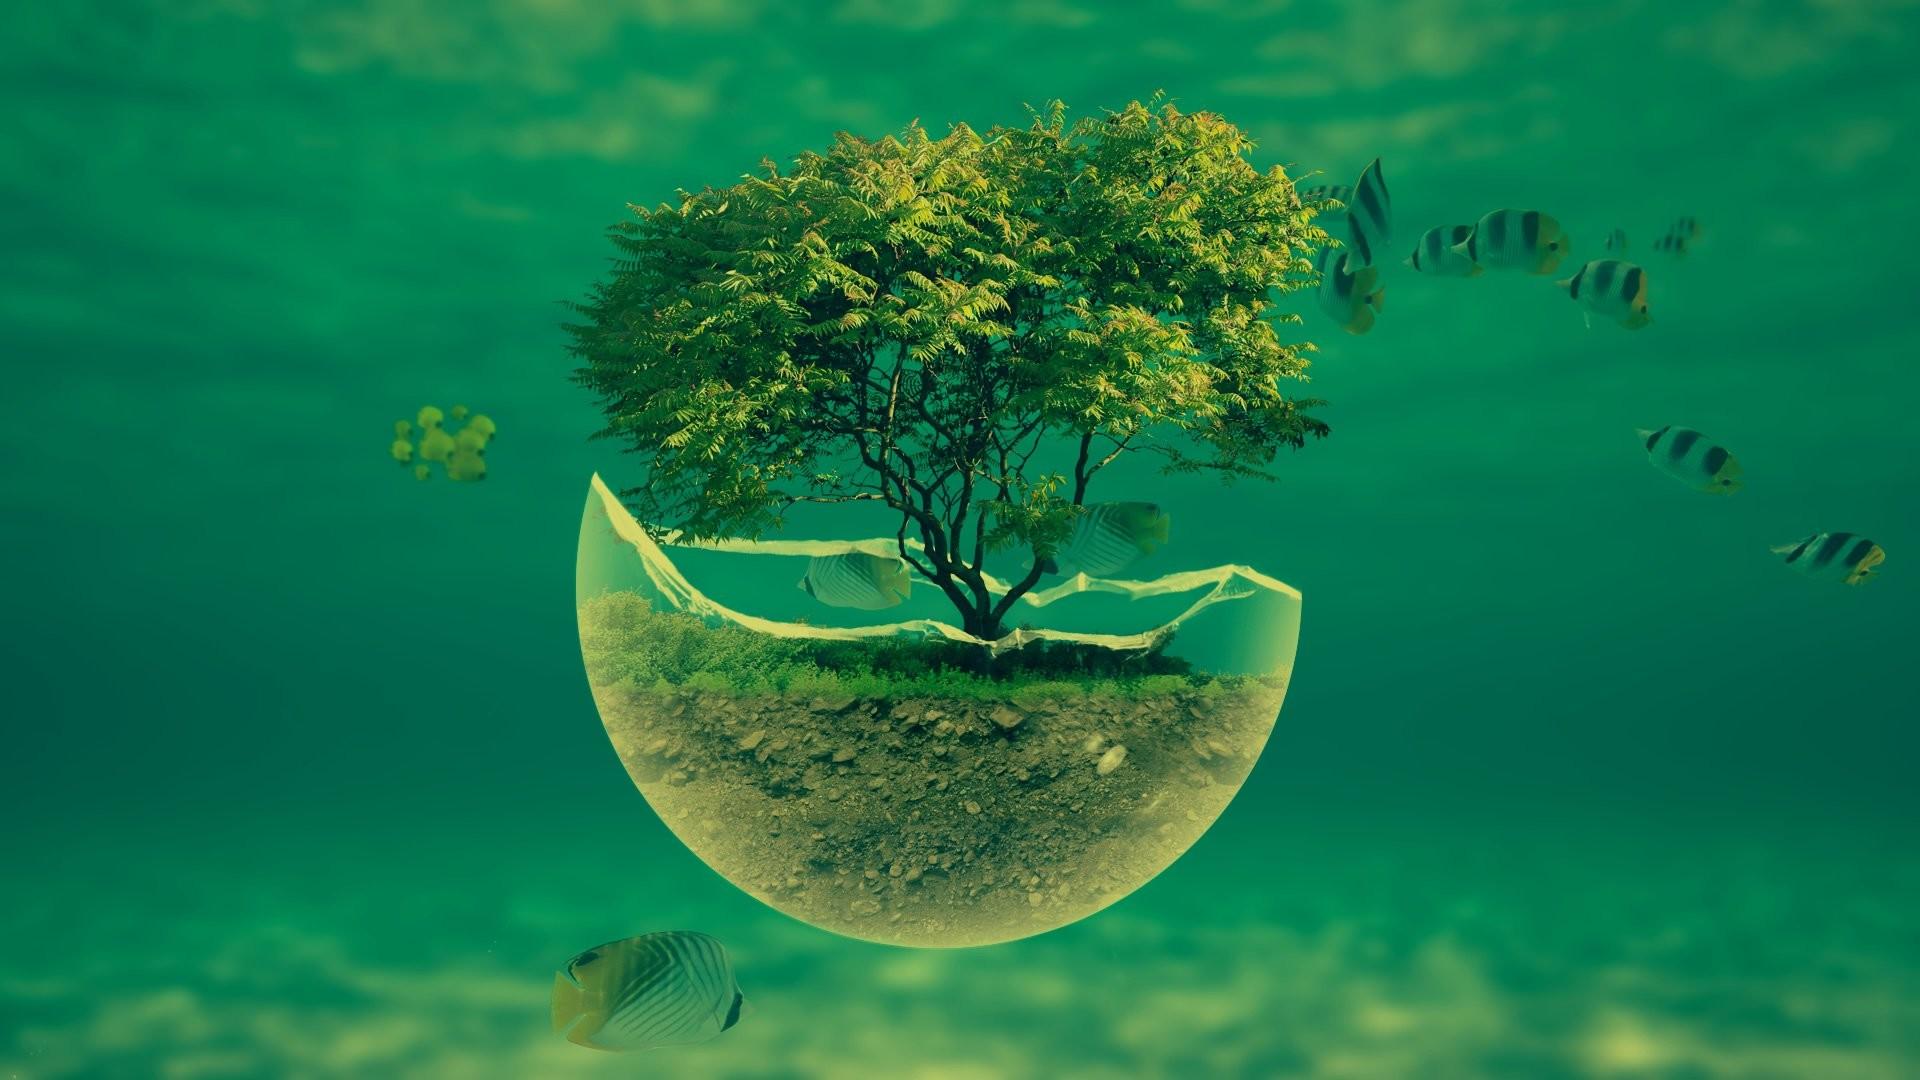 … 1188_3d_abstract 1920×1080-underwater-tree-widescreen-hd-abstract- desktop-wallpaper …